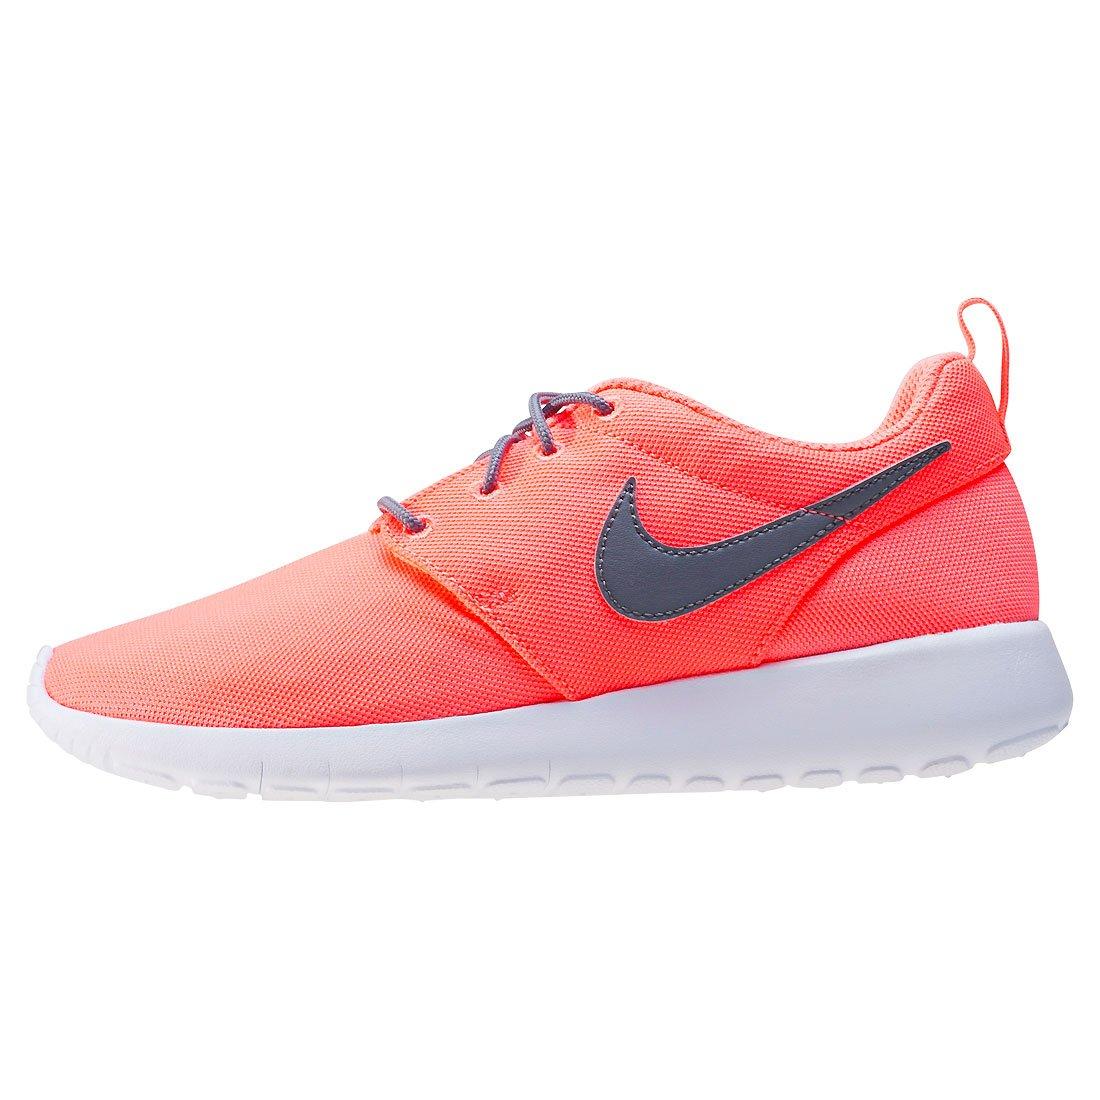 more photos f2ba2 8b17a Amazon.com   Nike - Roshe One GS - 599729612 - Color  Black-Orange - Size   5.5   Running